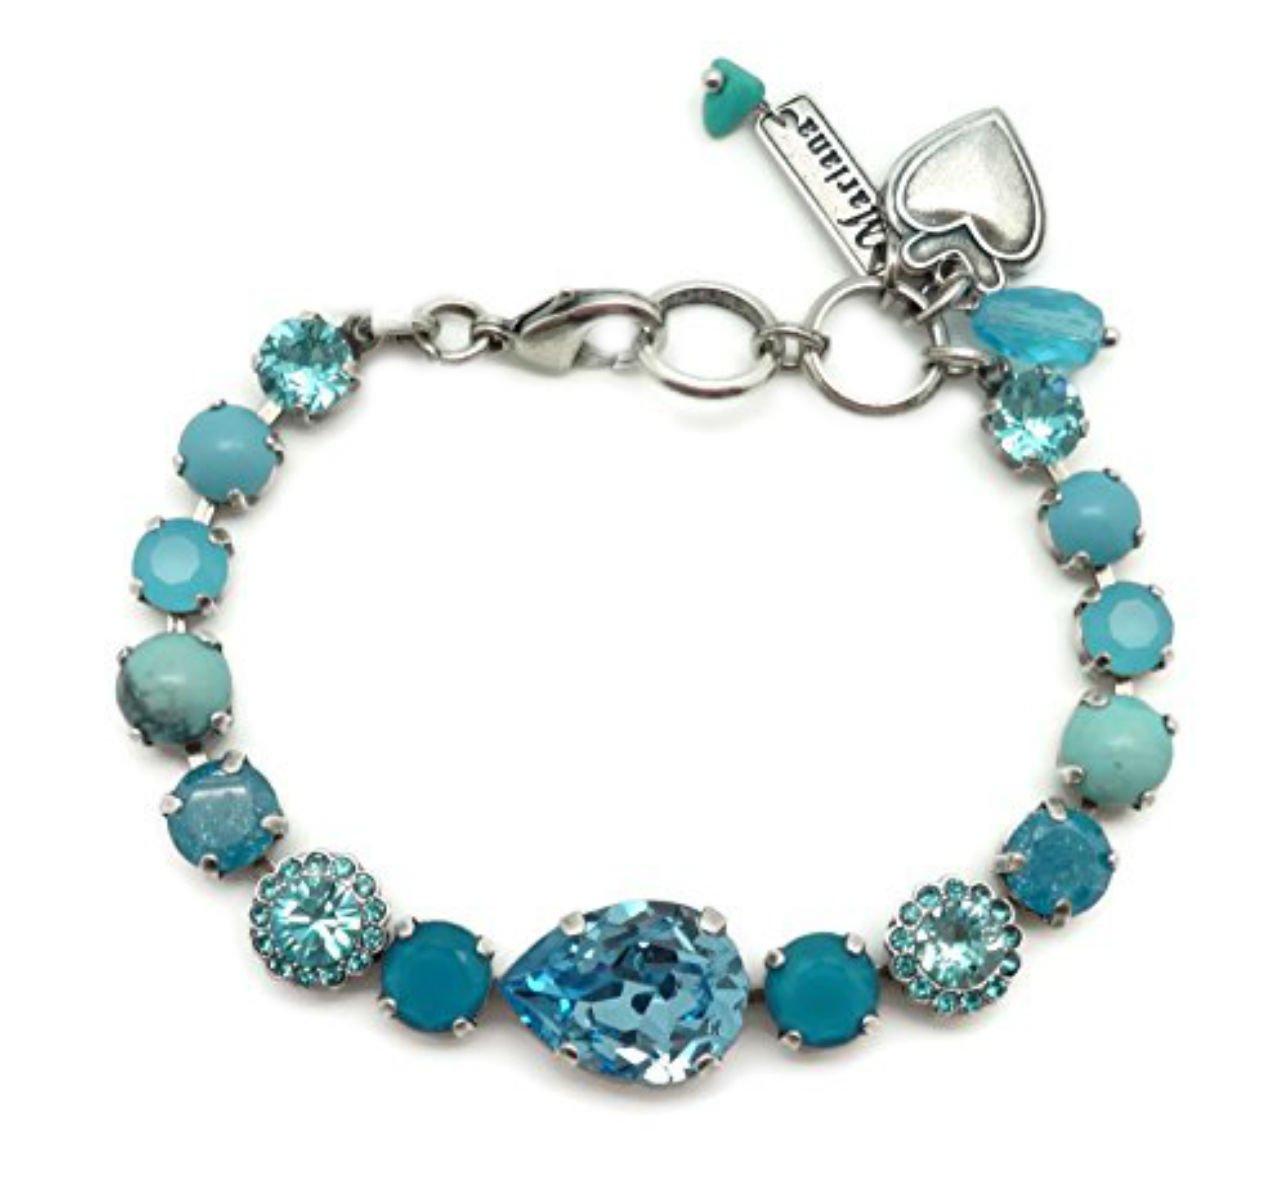 Mariana Silver Plated Swarovski Crystal Bracelet Aqua & Caribbean Blue Mix M1082 Zambezi